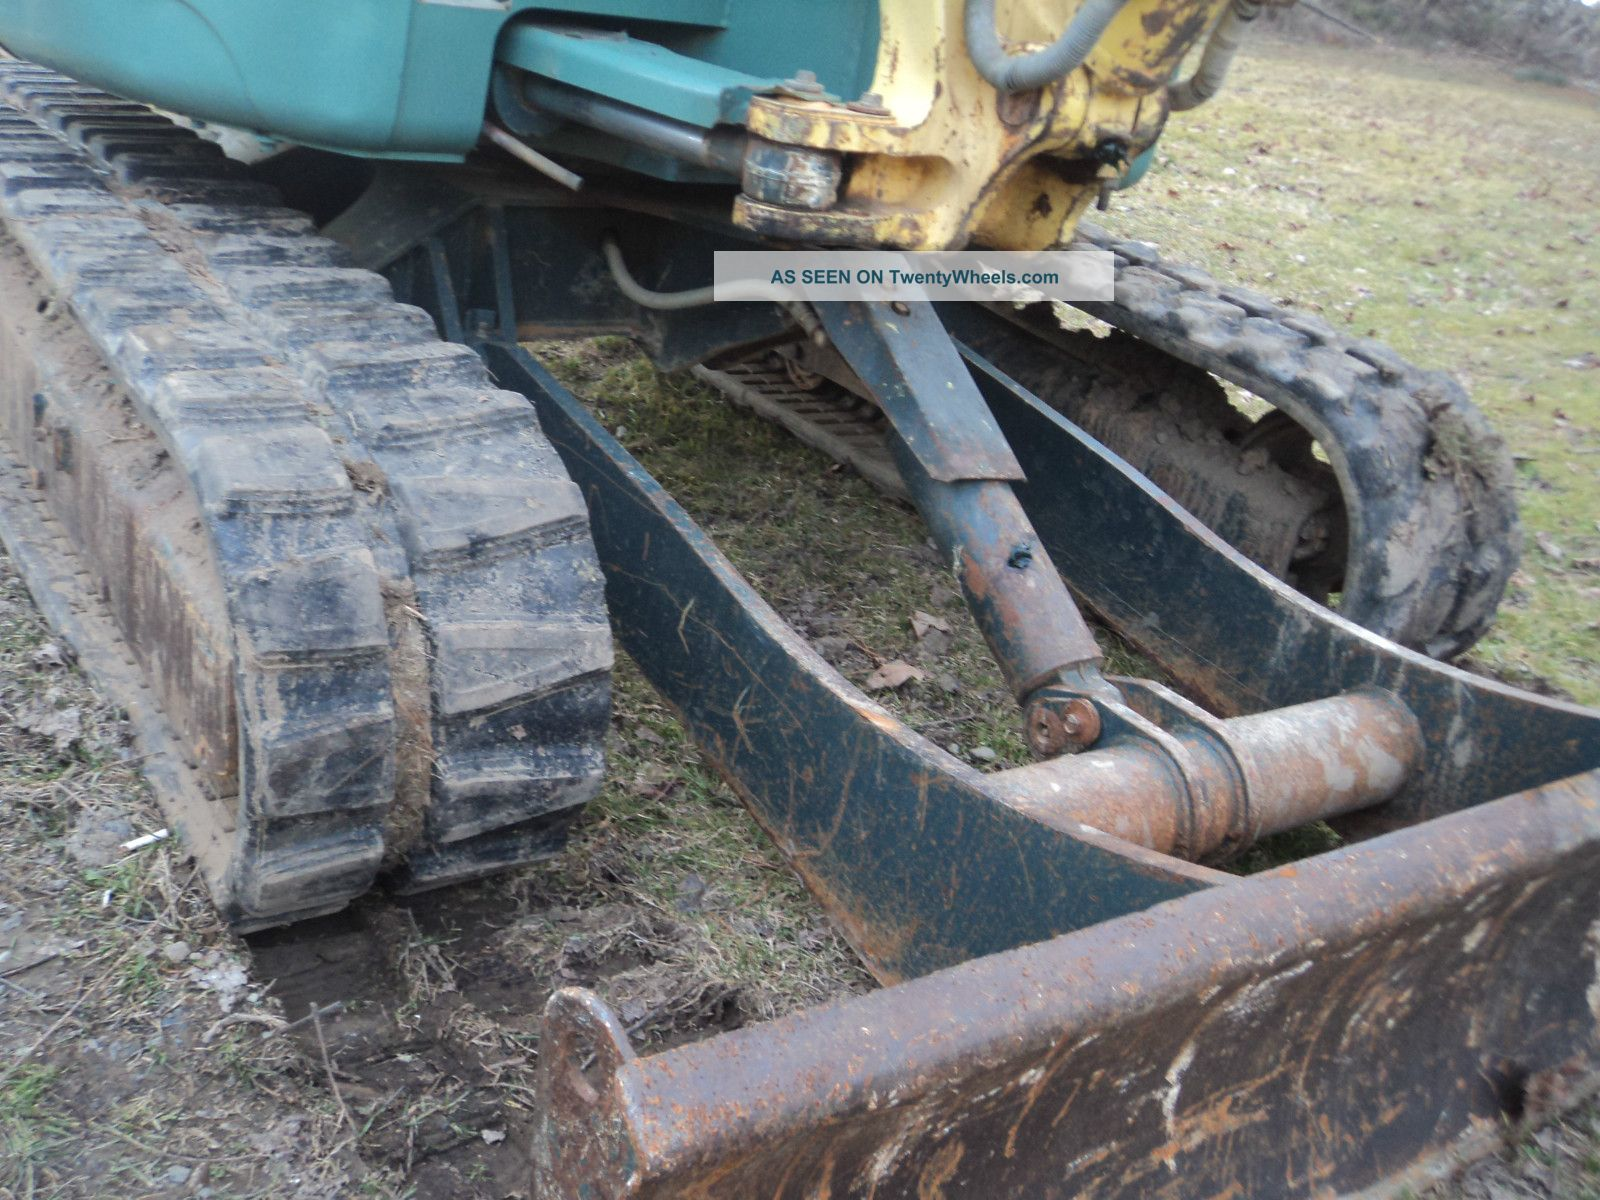 Caterpillar F Mining Truck likewise Mini Excavator Yanmar Vio Quick Disconnect Hydraulic Bucket Aux Hyd Lgw also Bobcat Skid Steer Loader Service Repair Manual in addition Bobcat Specifications X in addition Otc Ton Hydraulic Bulldozer Track Press Lgw. on bobcat 763 hydraulic specs